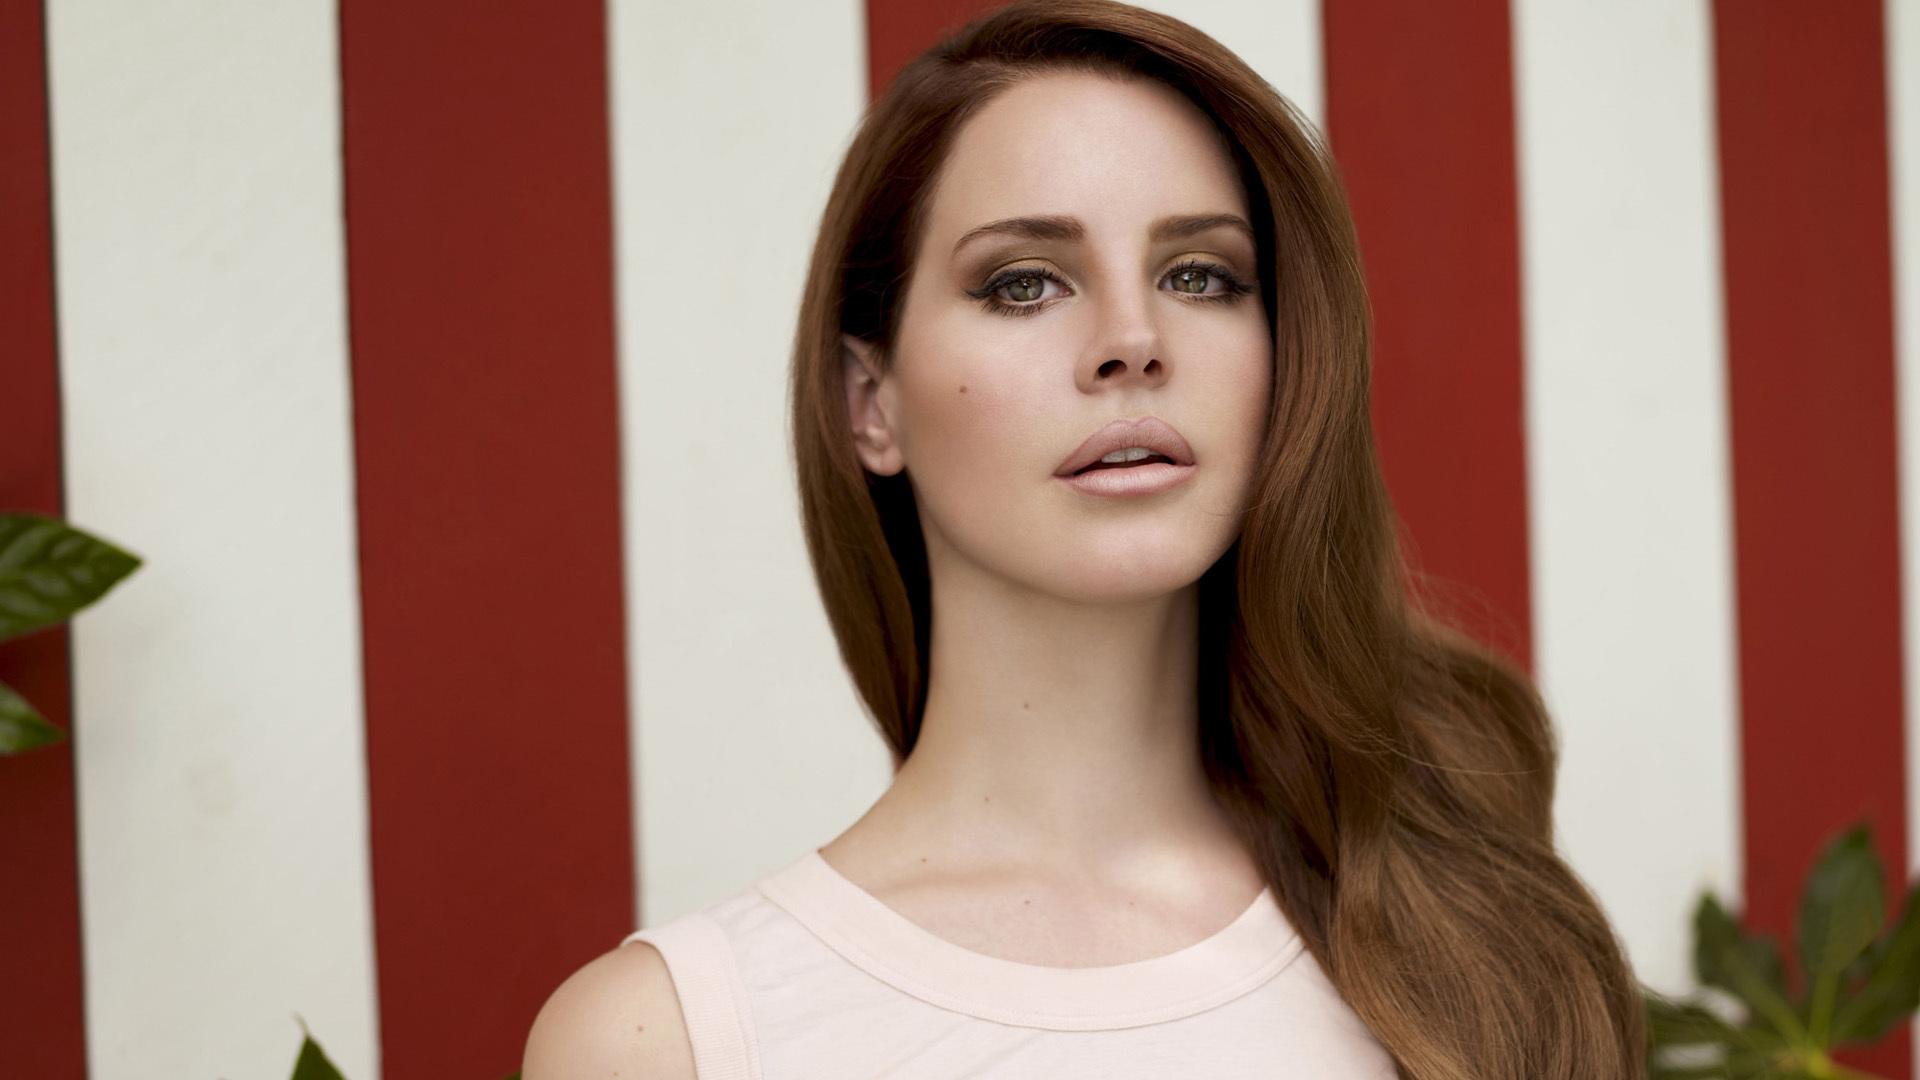 Lana Del Rey Computer Backgrounds